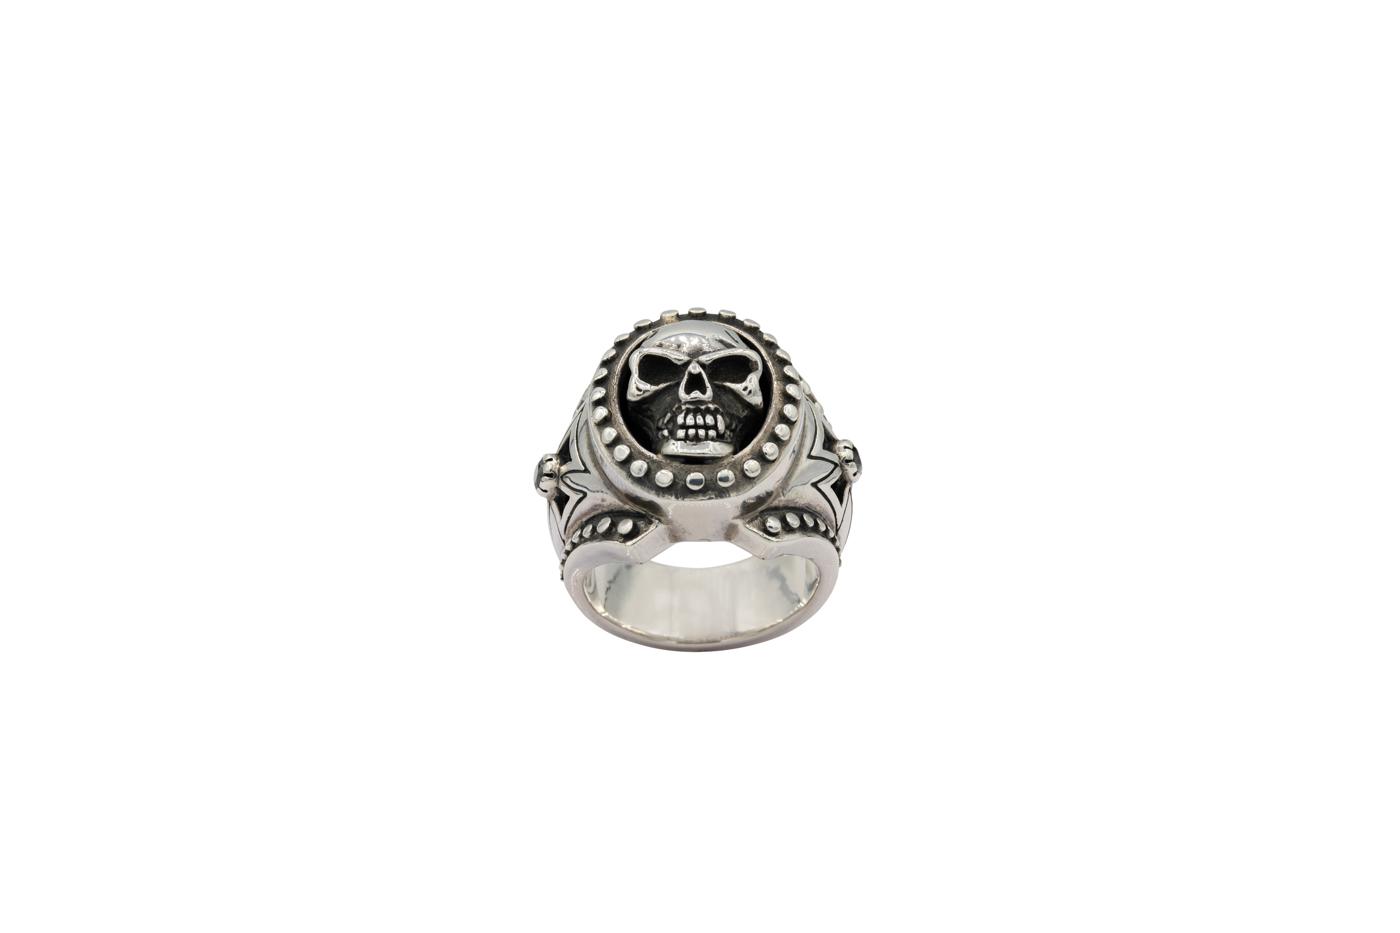 Harley-Davidson Skull Ring